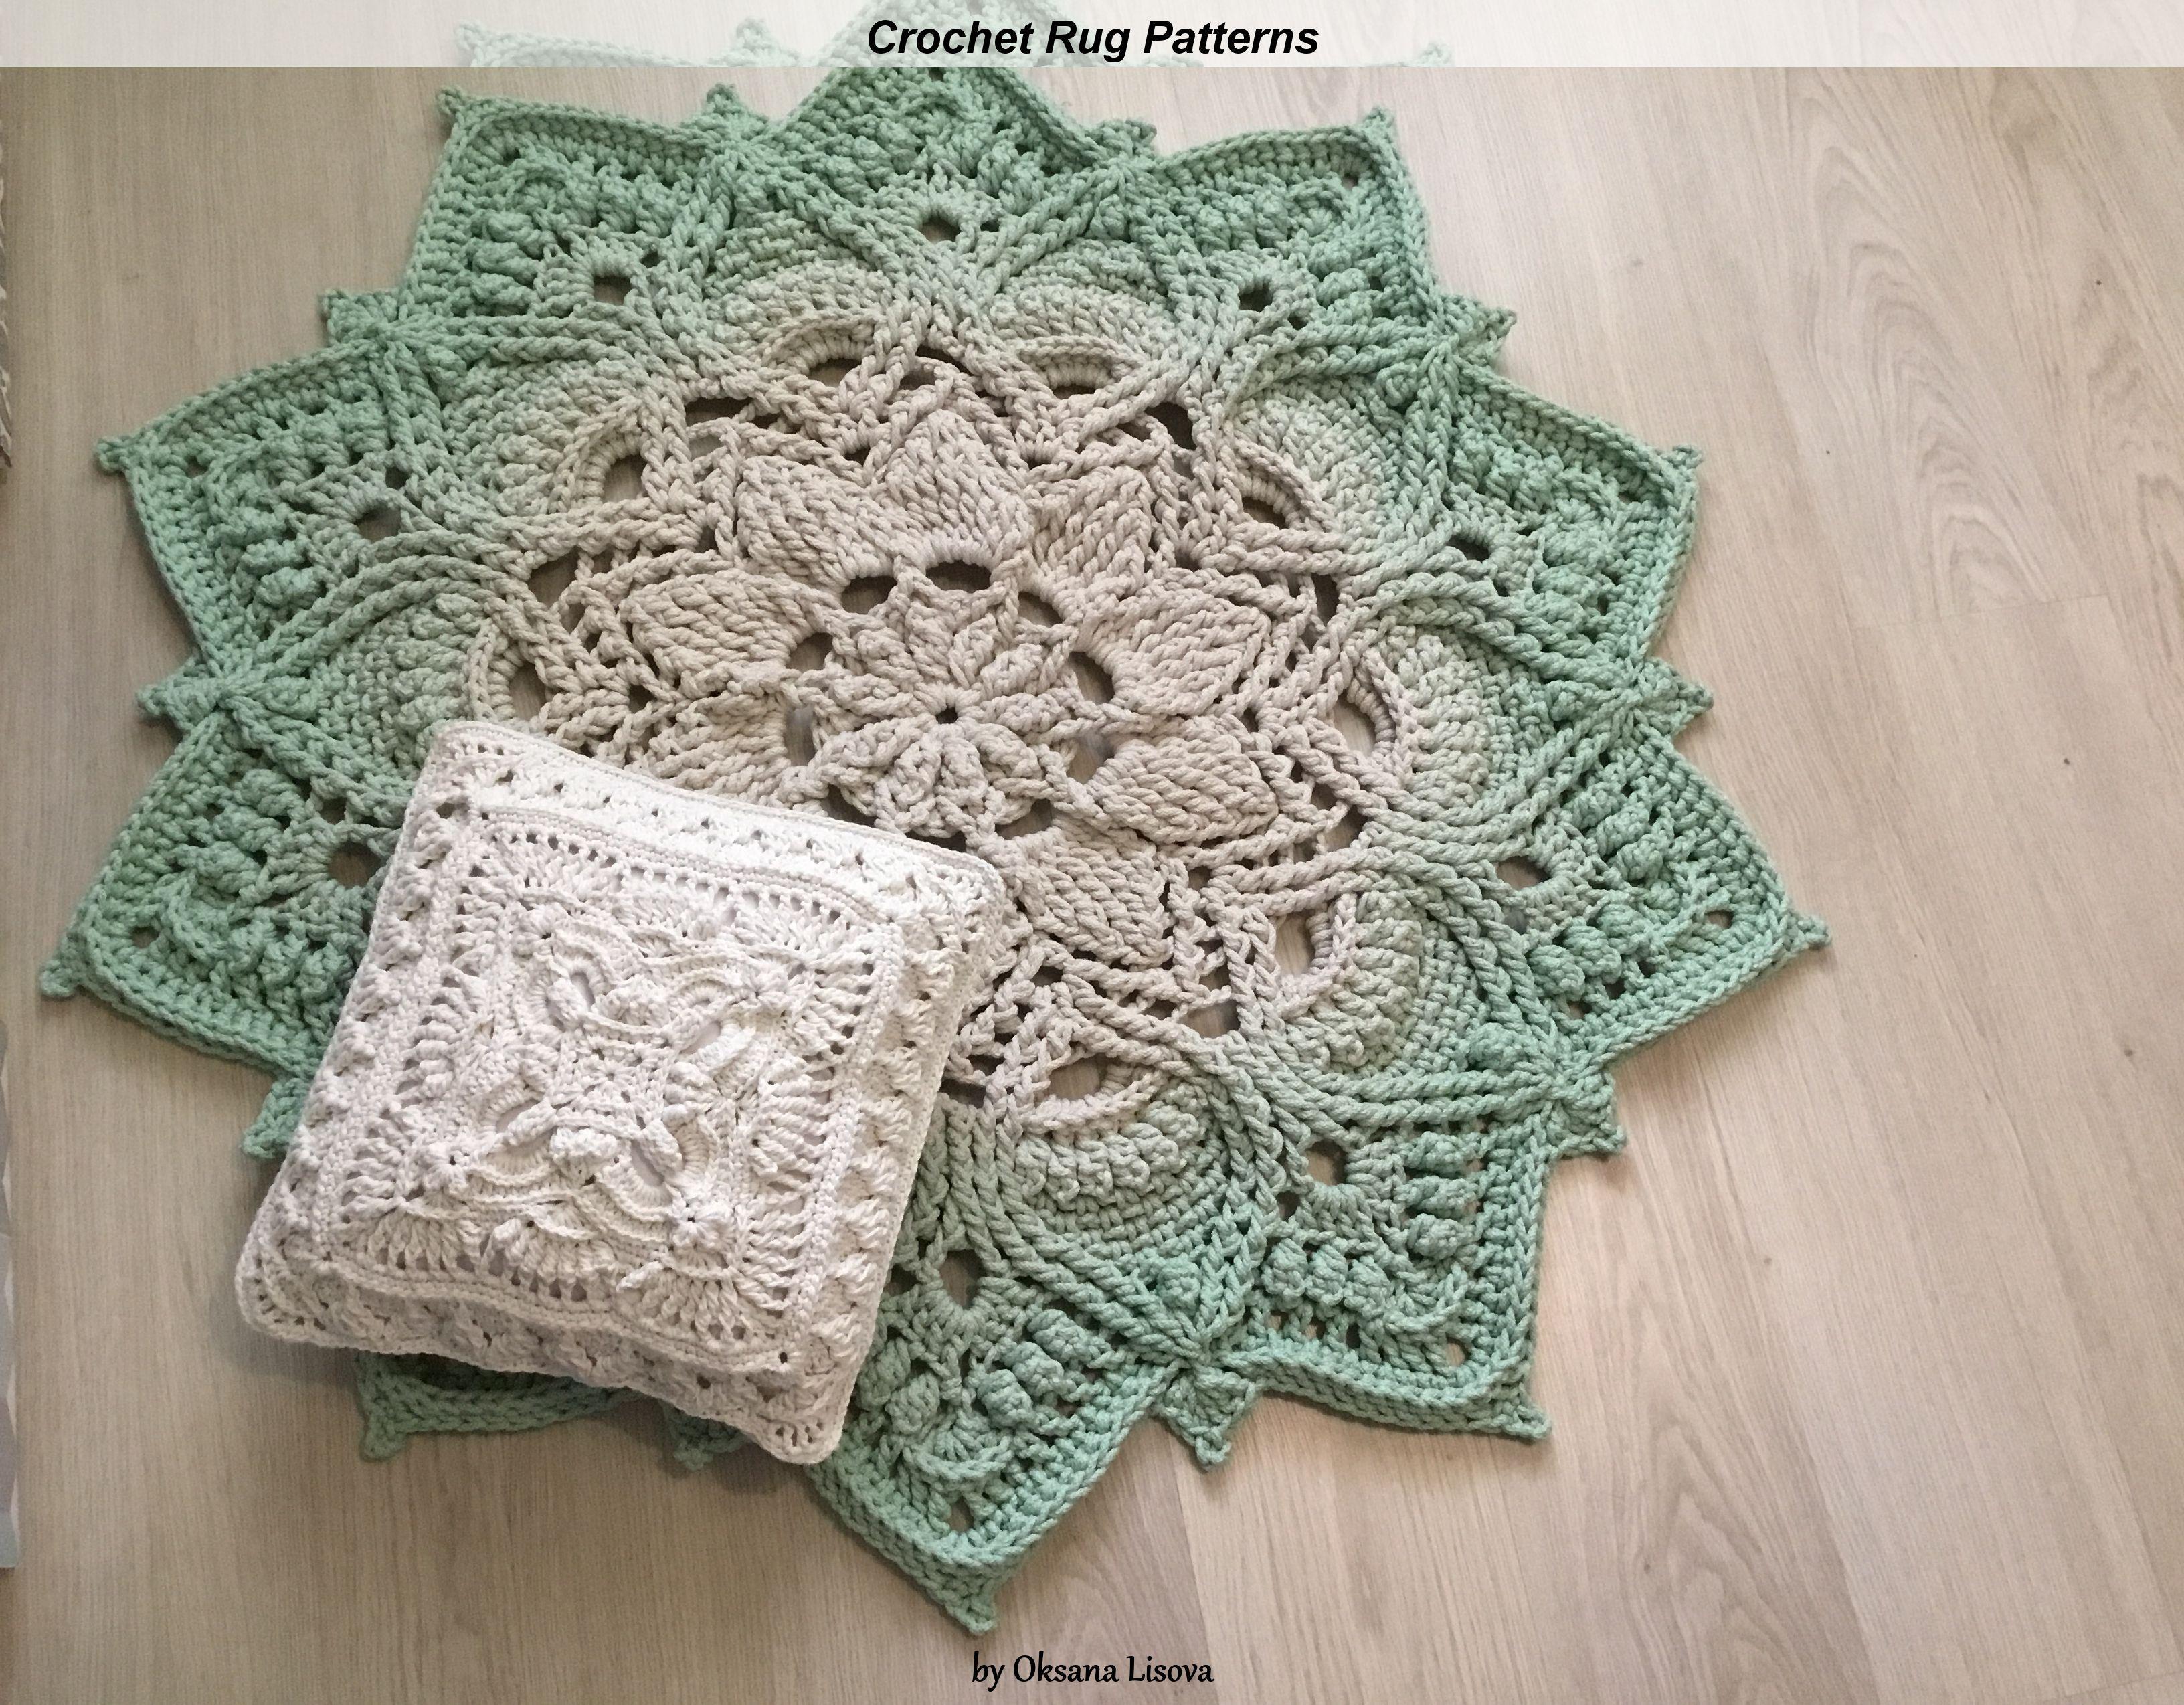 Video Tutorial Crocheting Rug Adonis Text Description In Etsy In 2020 Crochet Rug Patterns Crochet Rug Rug Pattern